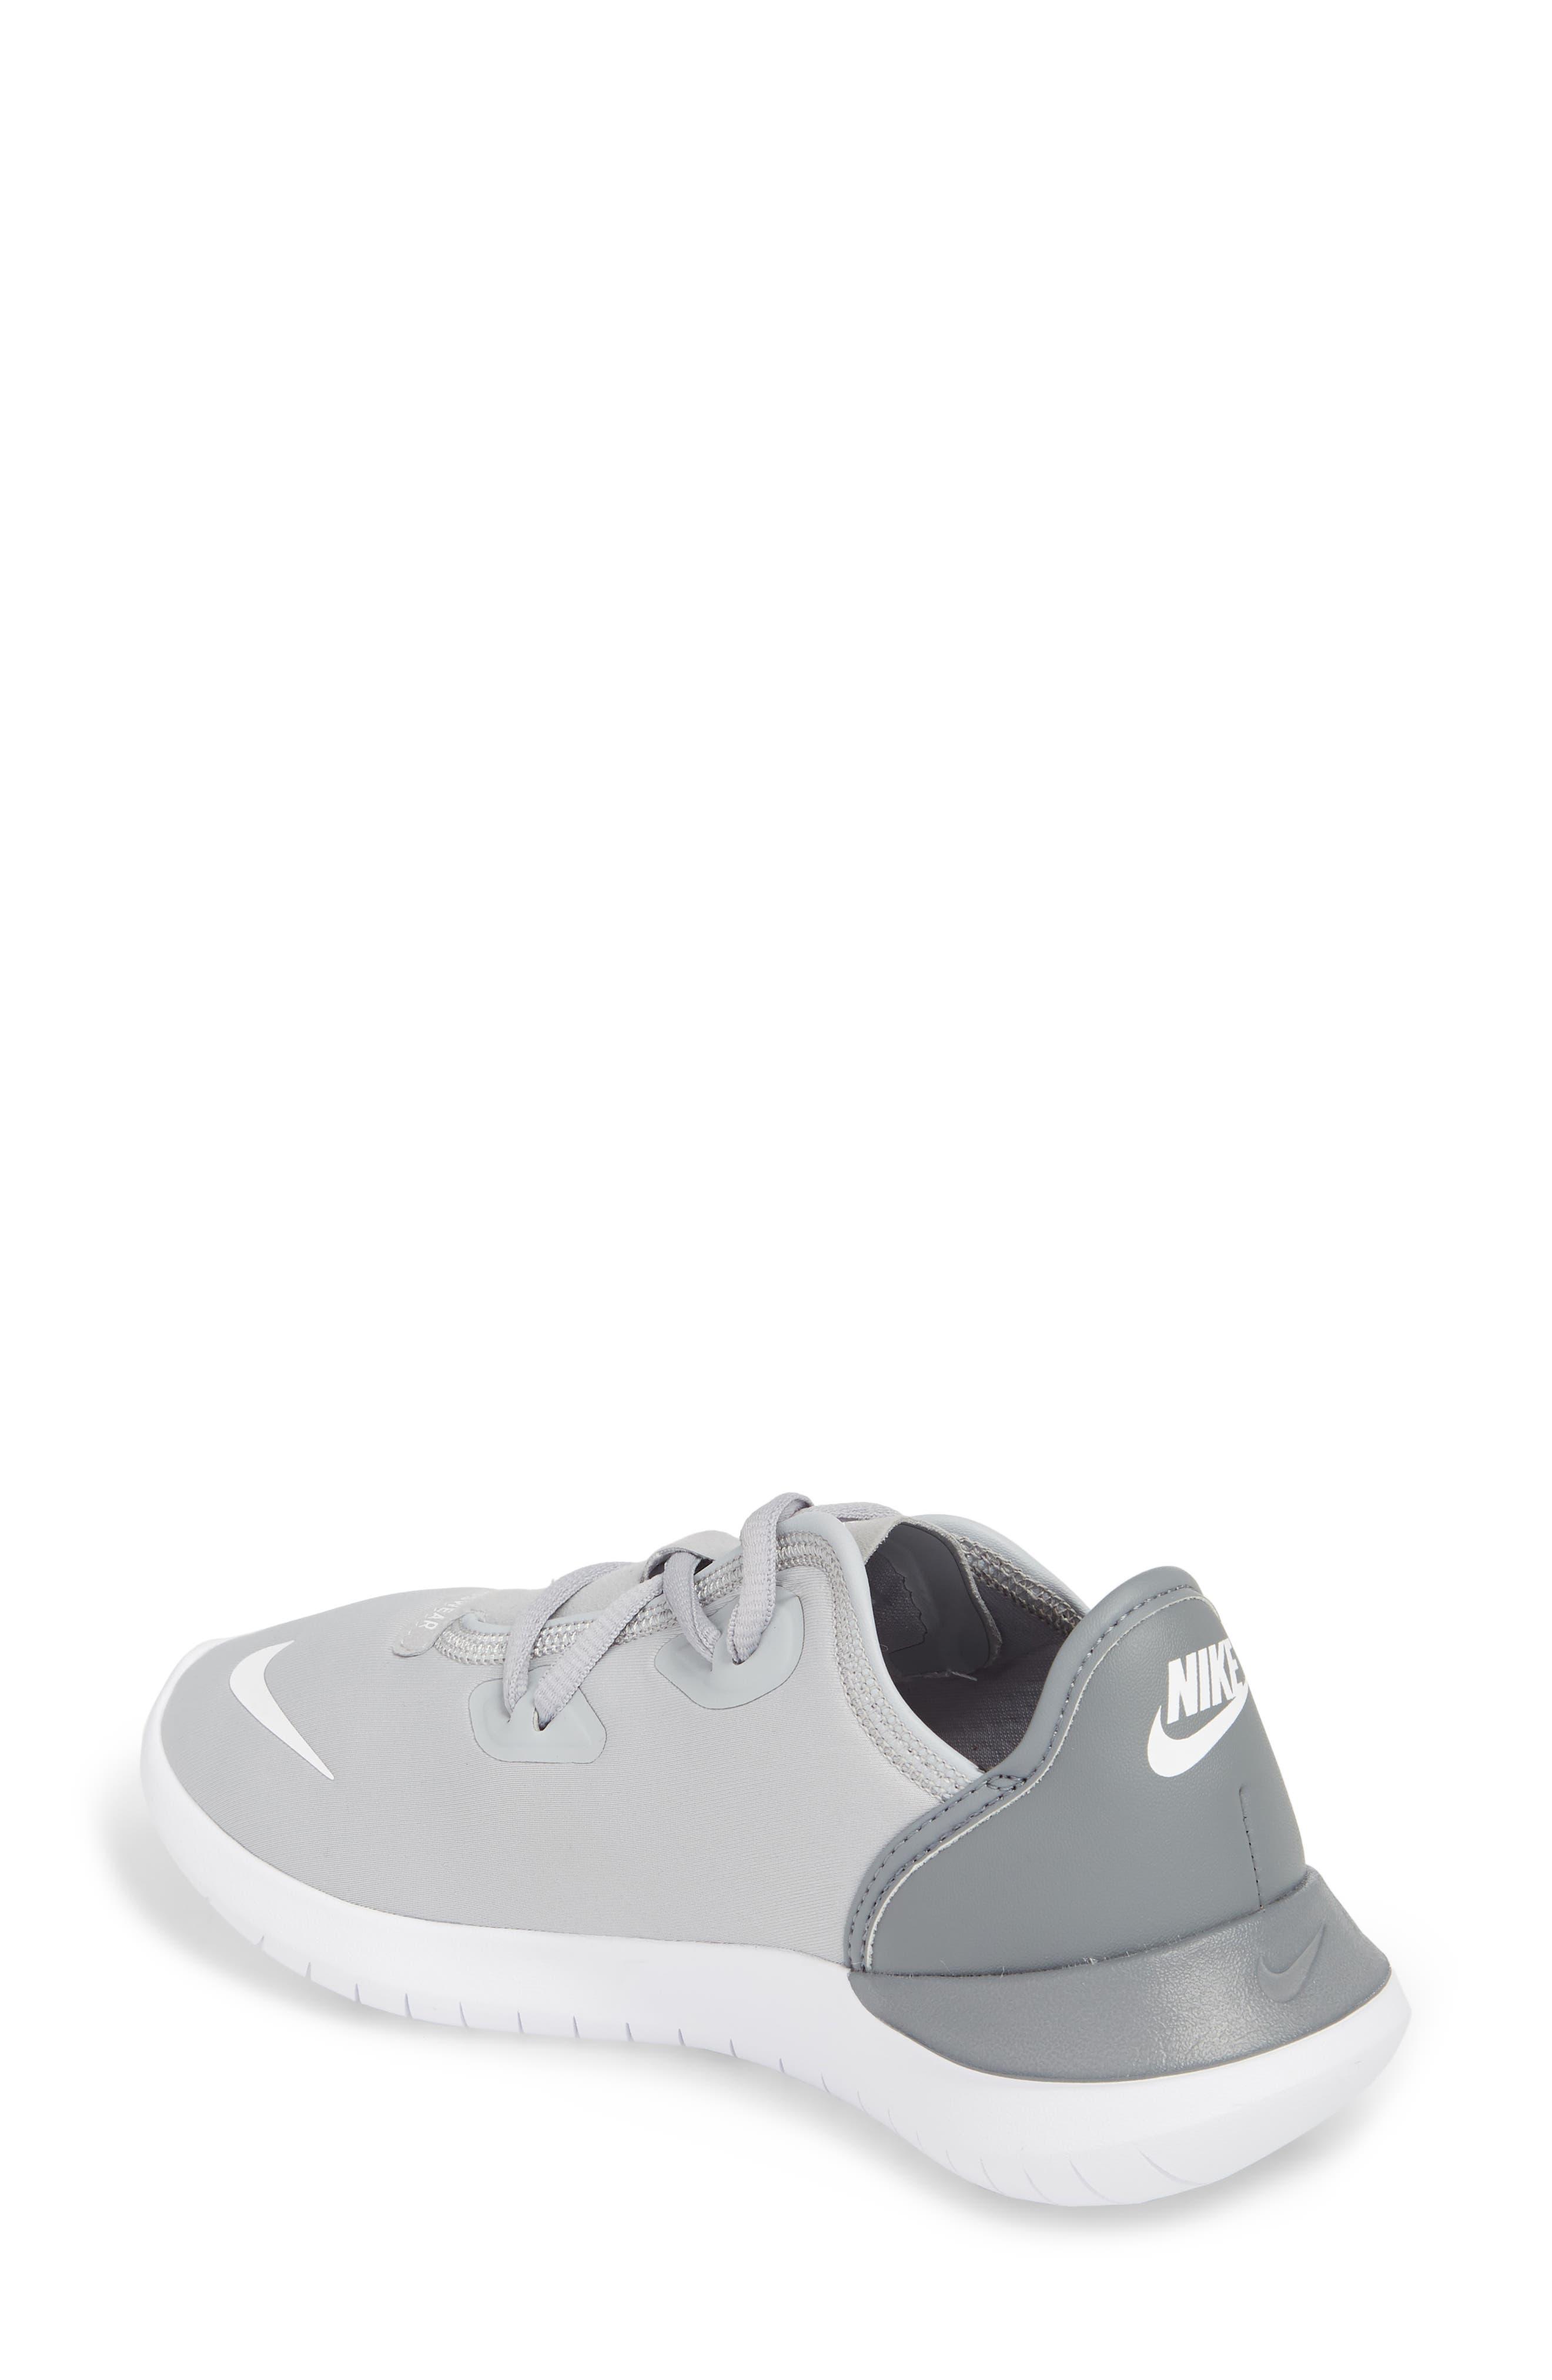 Hakata Sneaker,                             Alternate thumbnail 2, color,                             Wolf Grey/ White